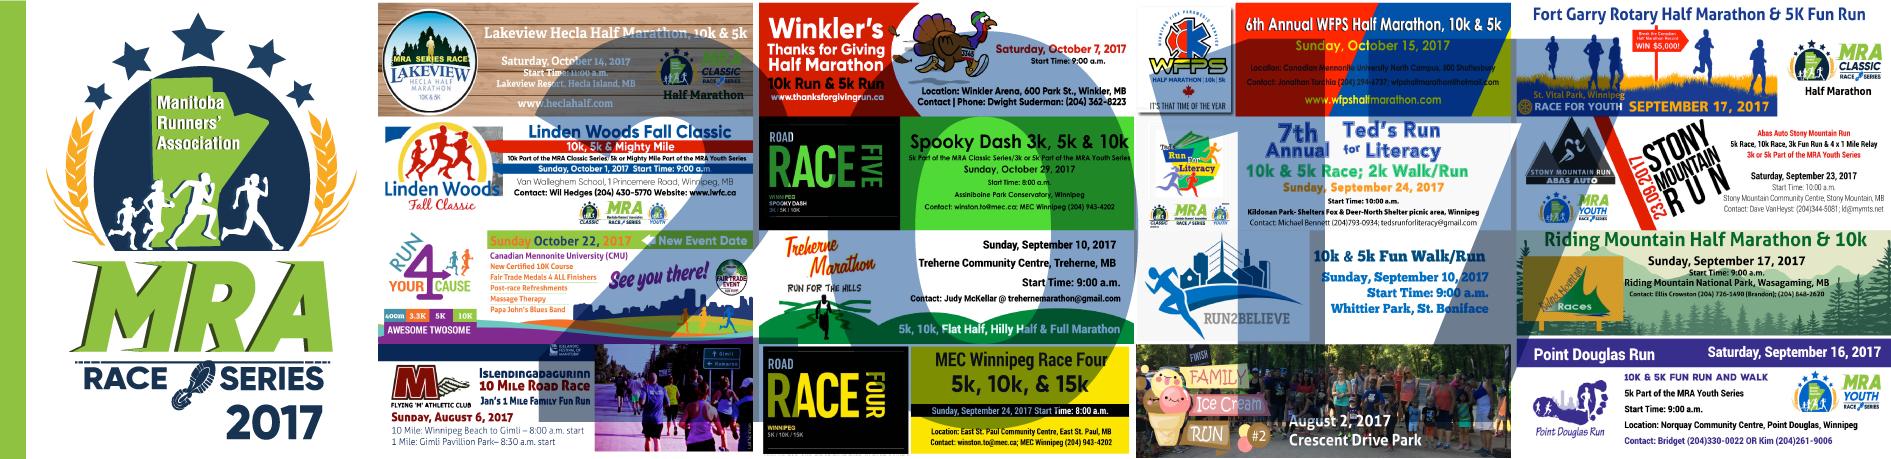 MRA Race Series 2017